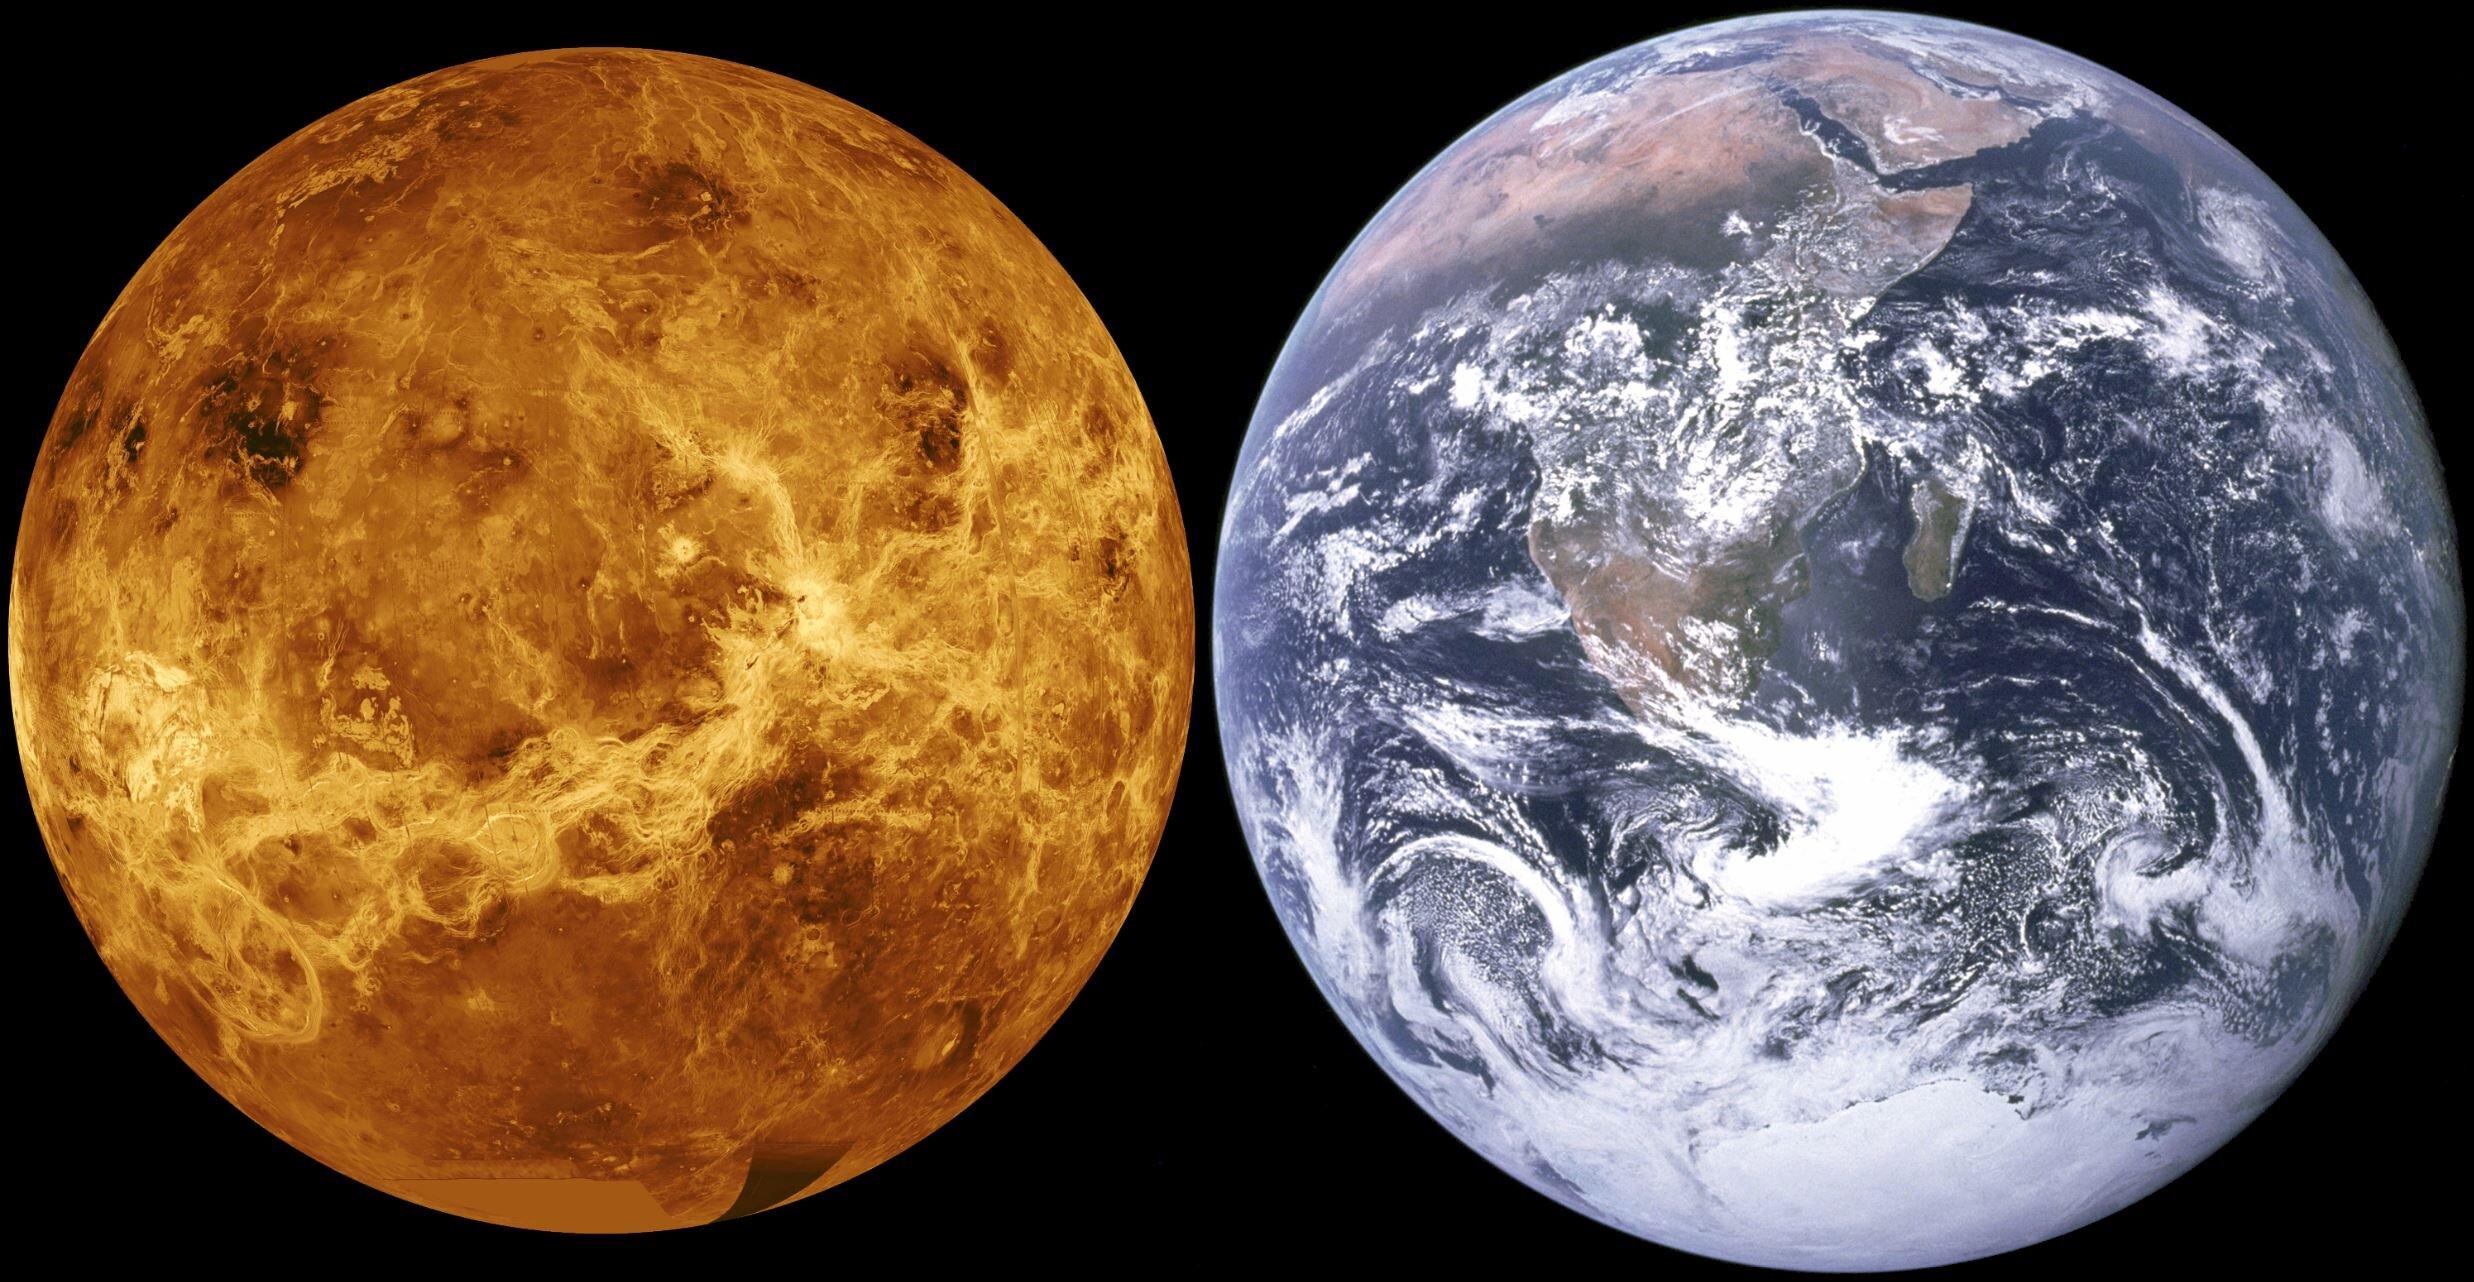 Image Credit:  Earth Image: NASA/Apollo 17 crew / Venus image: NASA via Wikimedia Commons